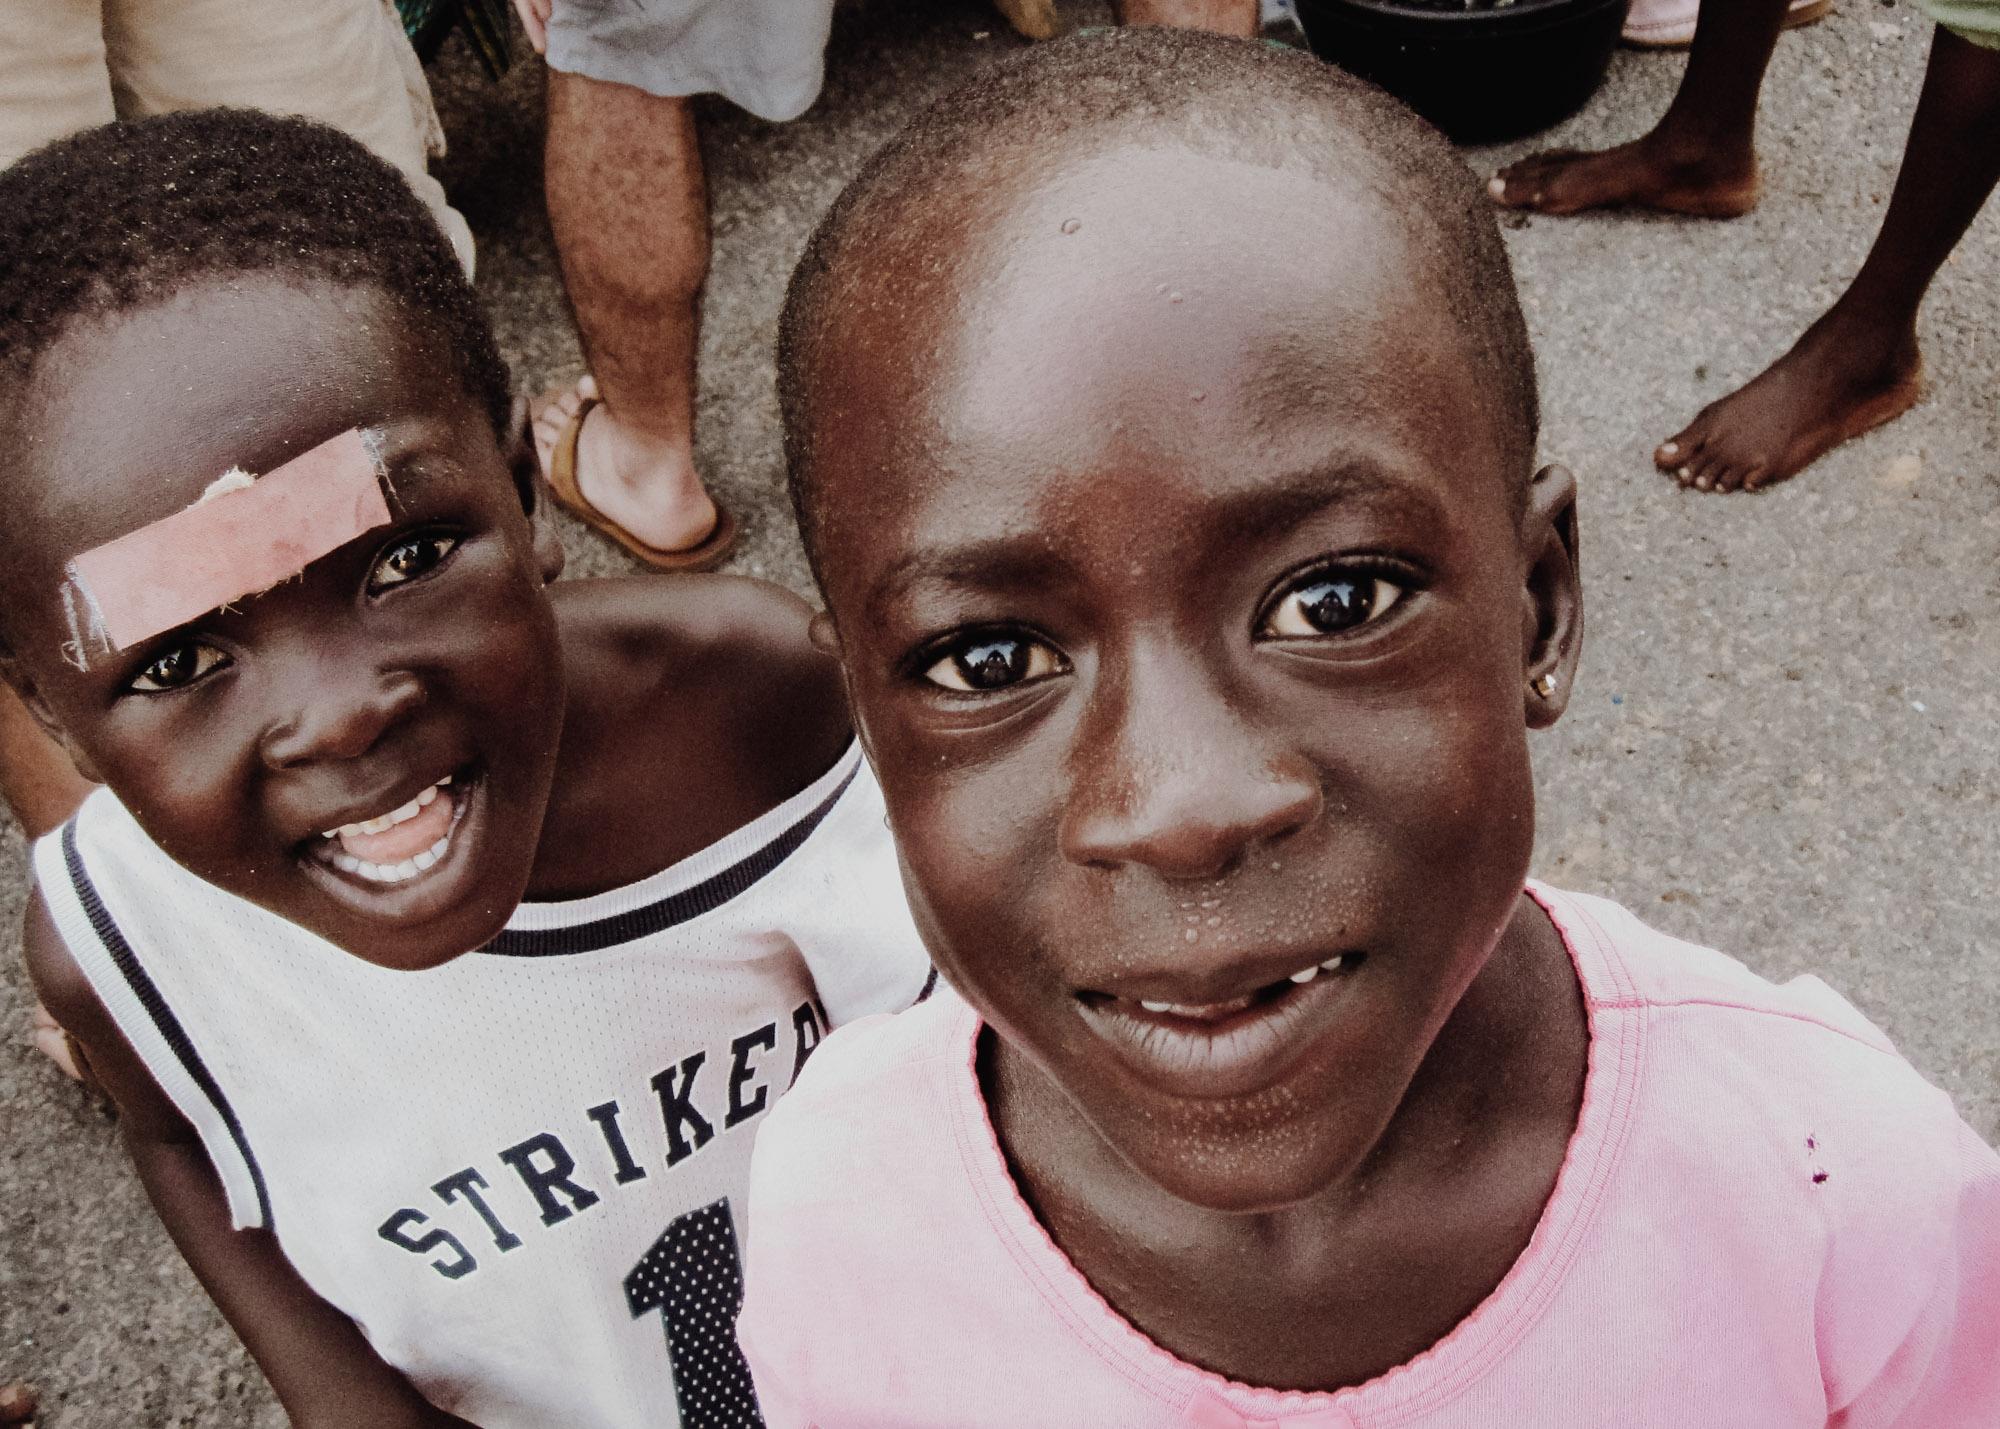 Children in Cape Coast, Ghana | Photo by Caroline Taft,  The Brazen Gourmand